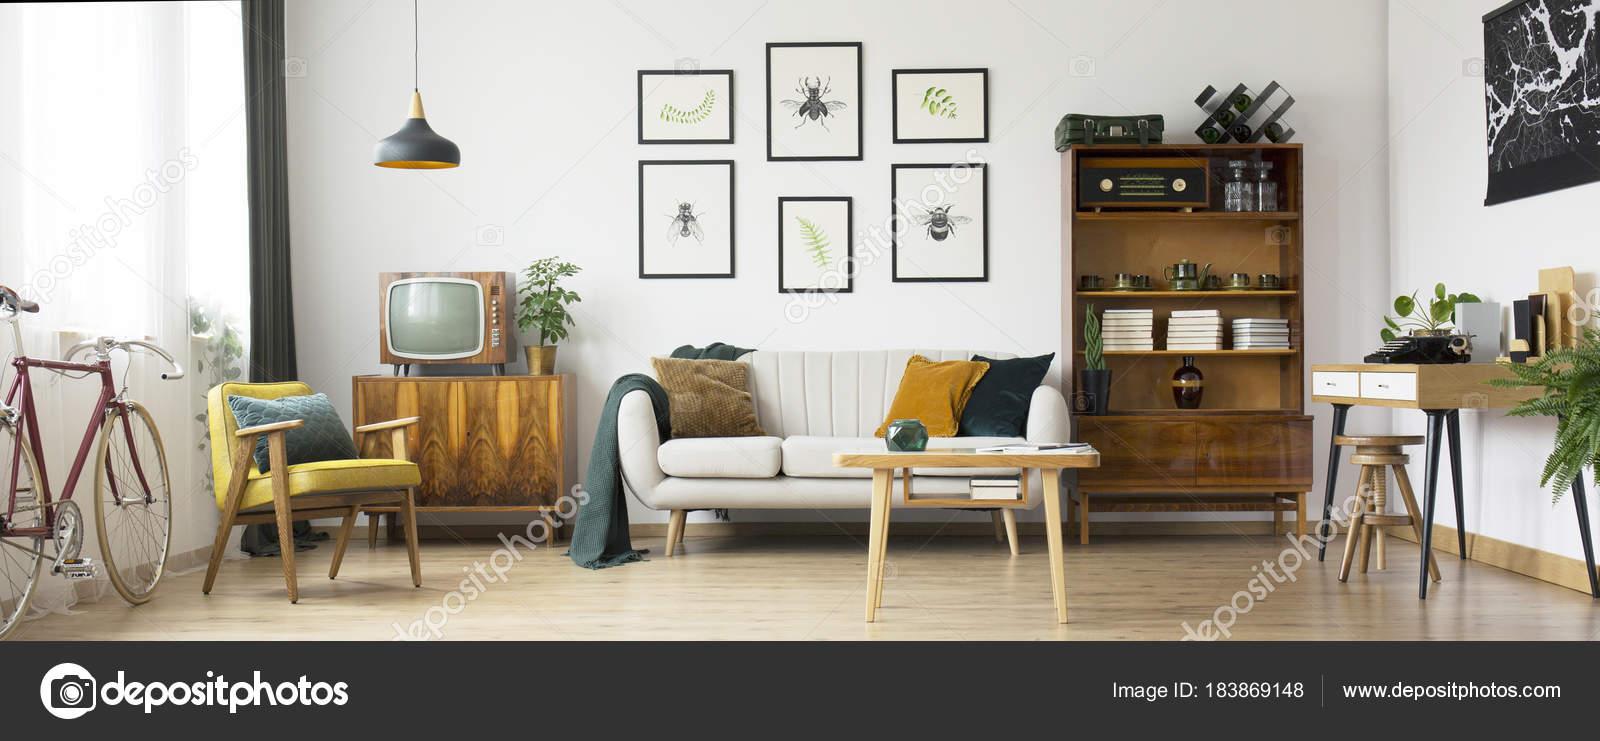 Retro Wohnzimmer Design Stockfoto C Photographee Eu 183869148